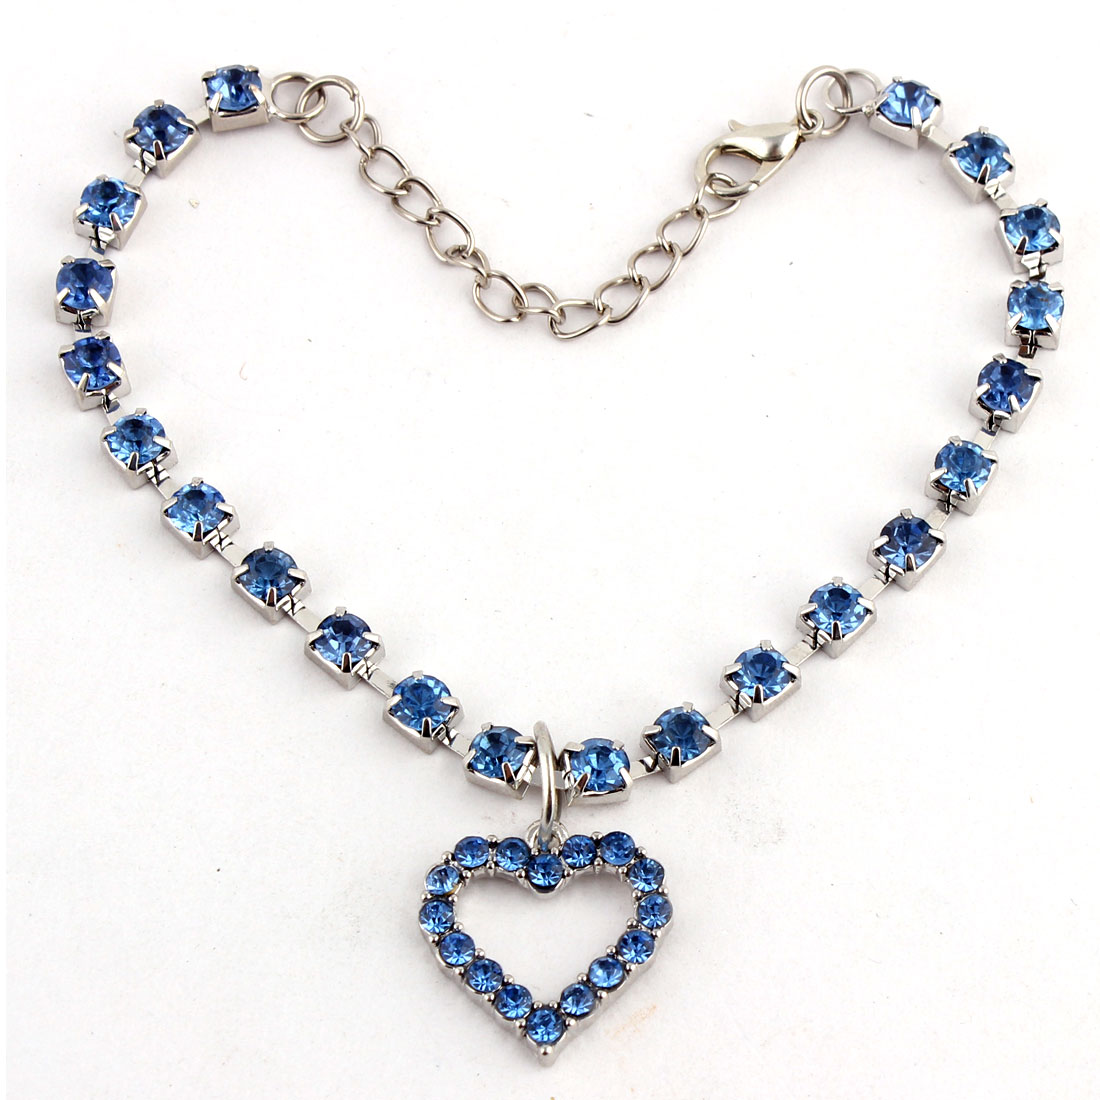 Dog Metal Beads Linked Rhinestone Inlaid Heart Shaped Pendant Necklace Blue